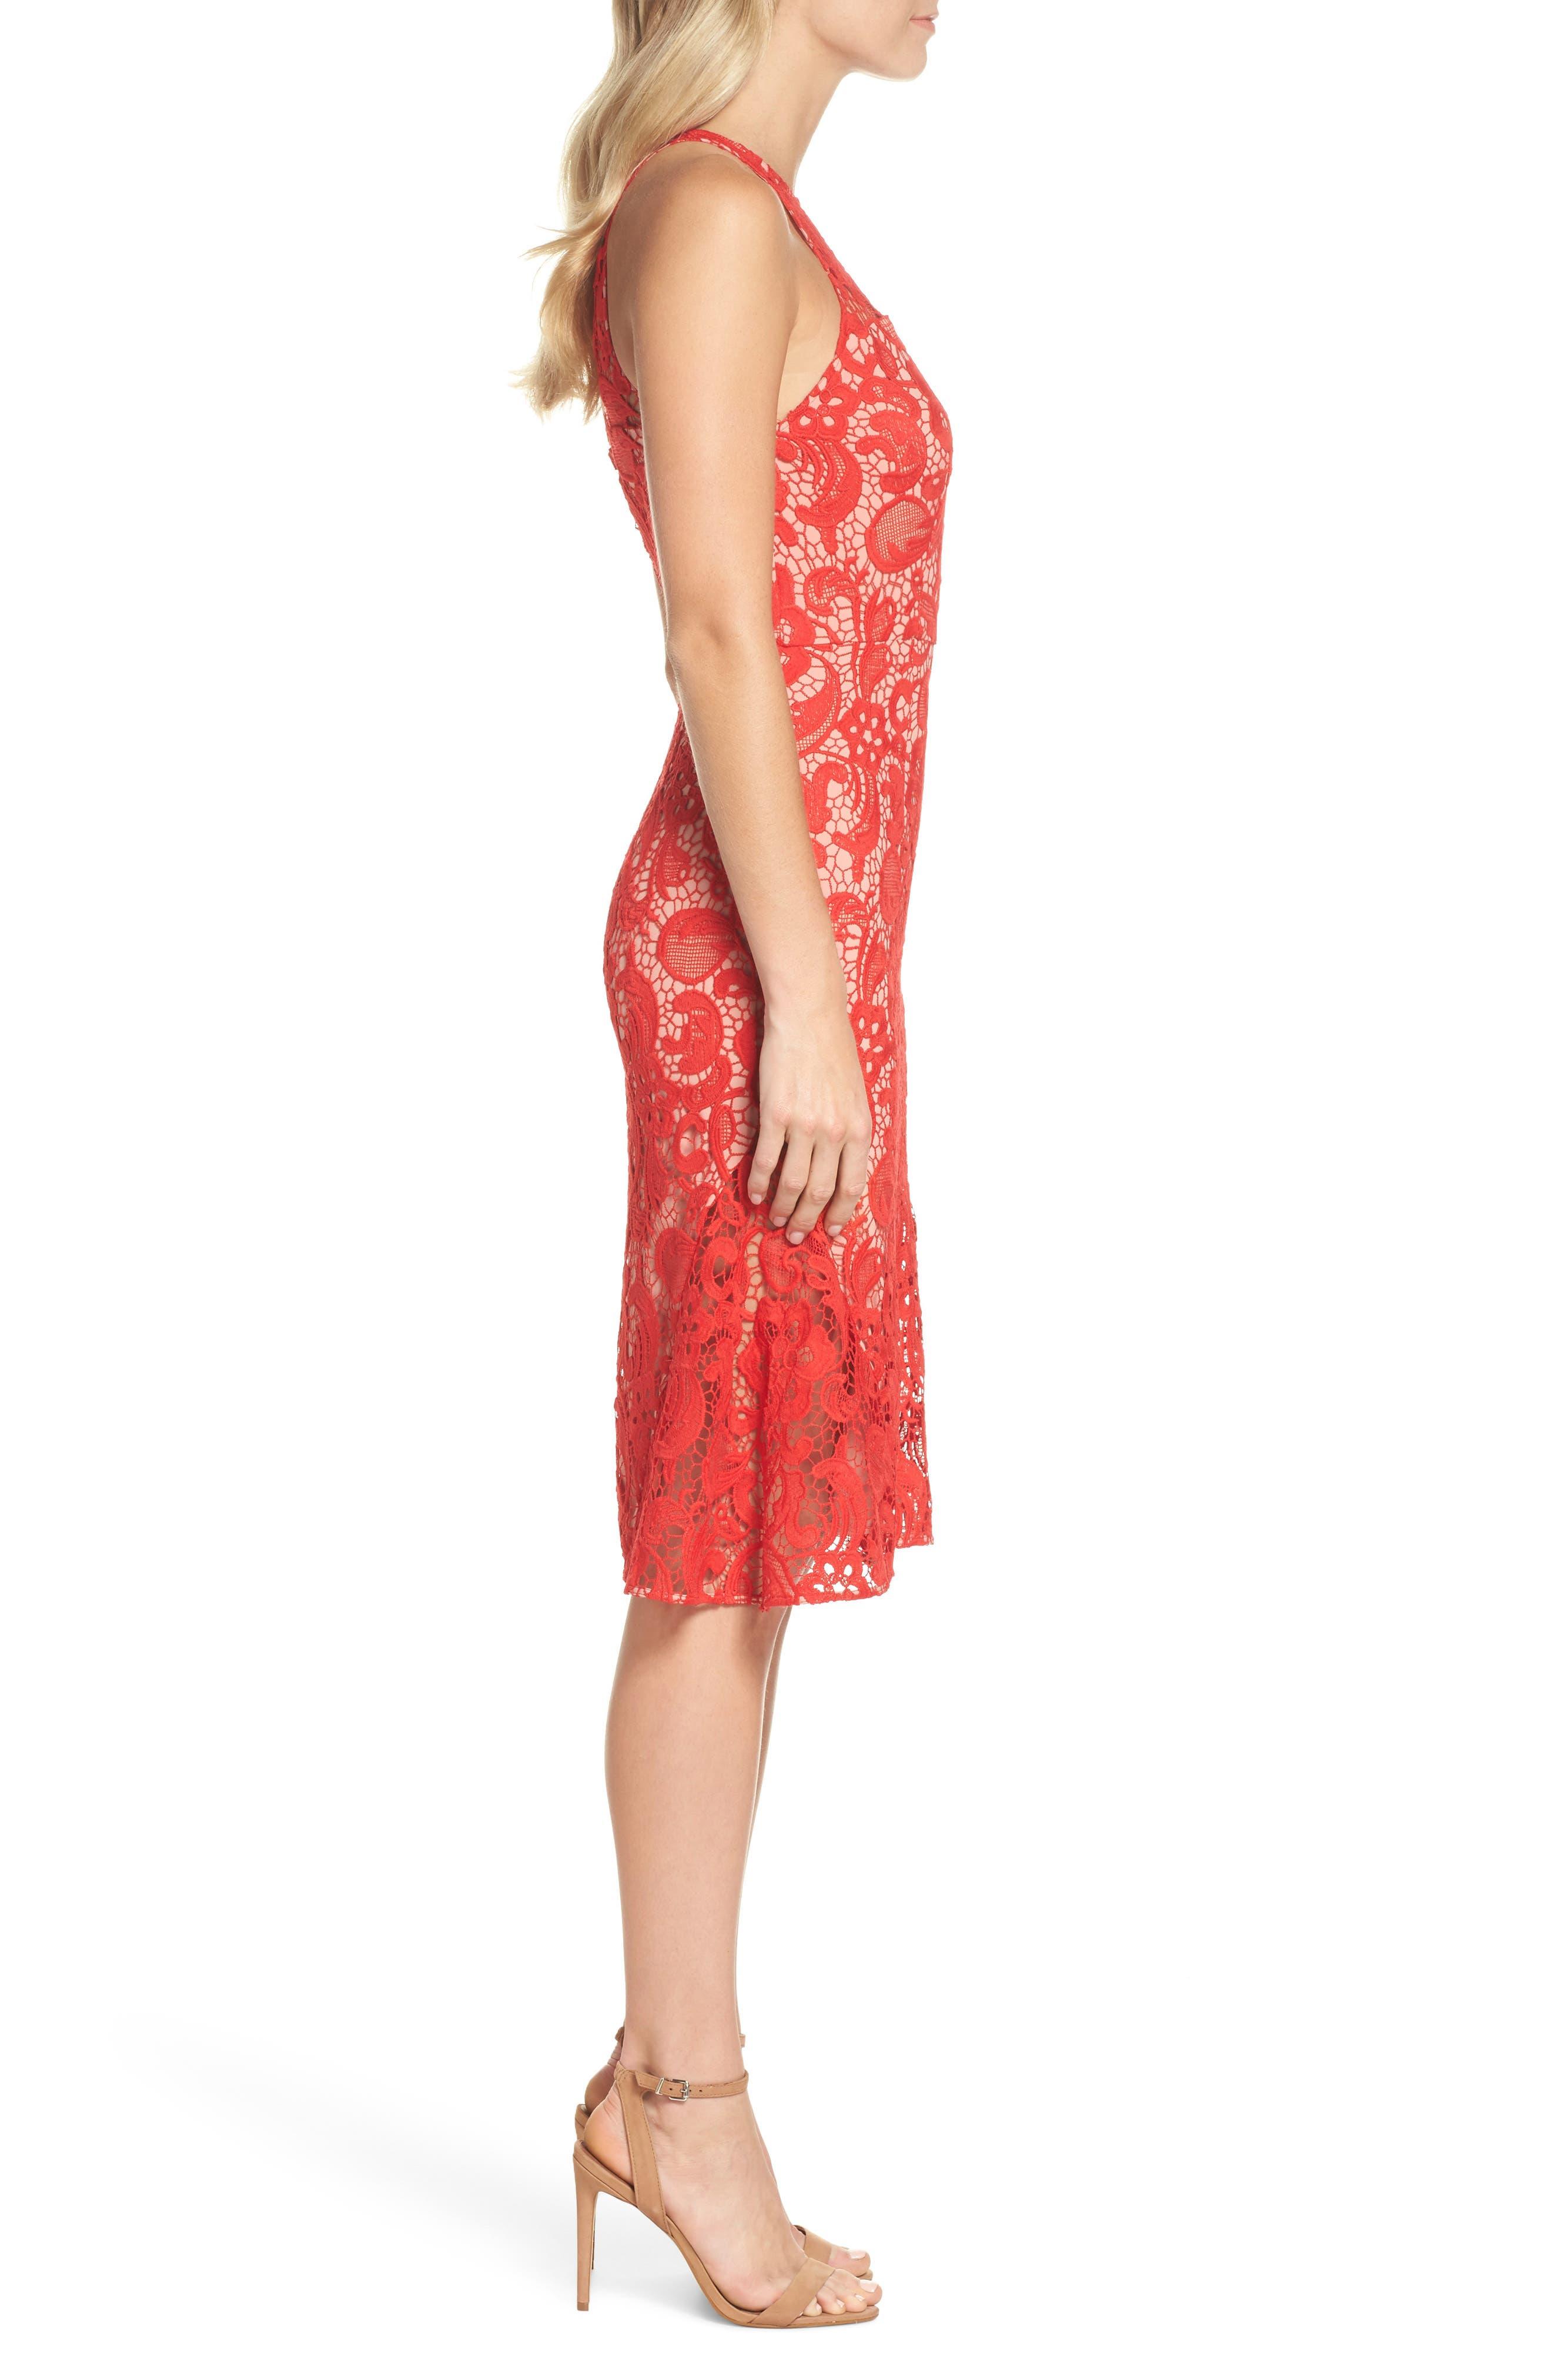 Carnation Lace Dress,                             Alternate thumbnail 3, color,                             600